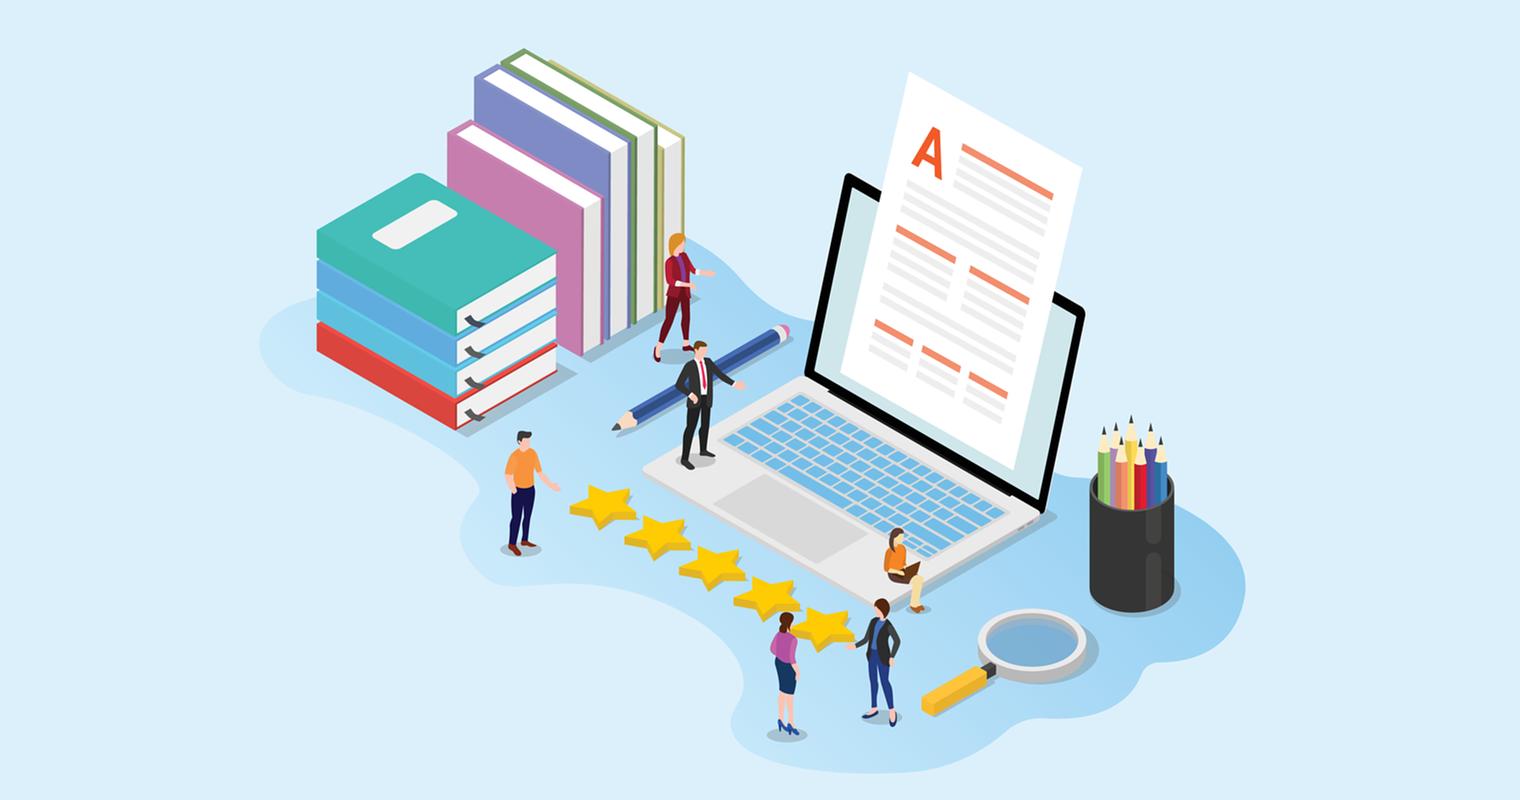 3-Step Blog Strategy That Works: Storytelling, USPs & Sales